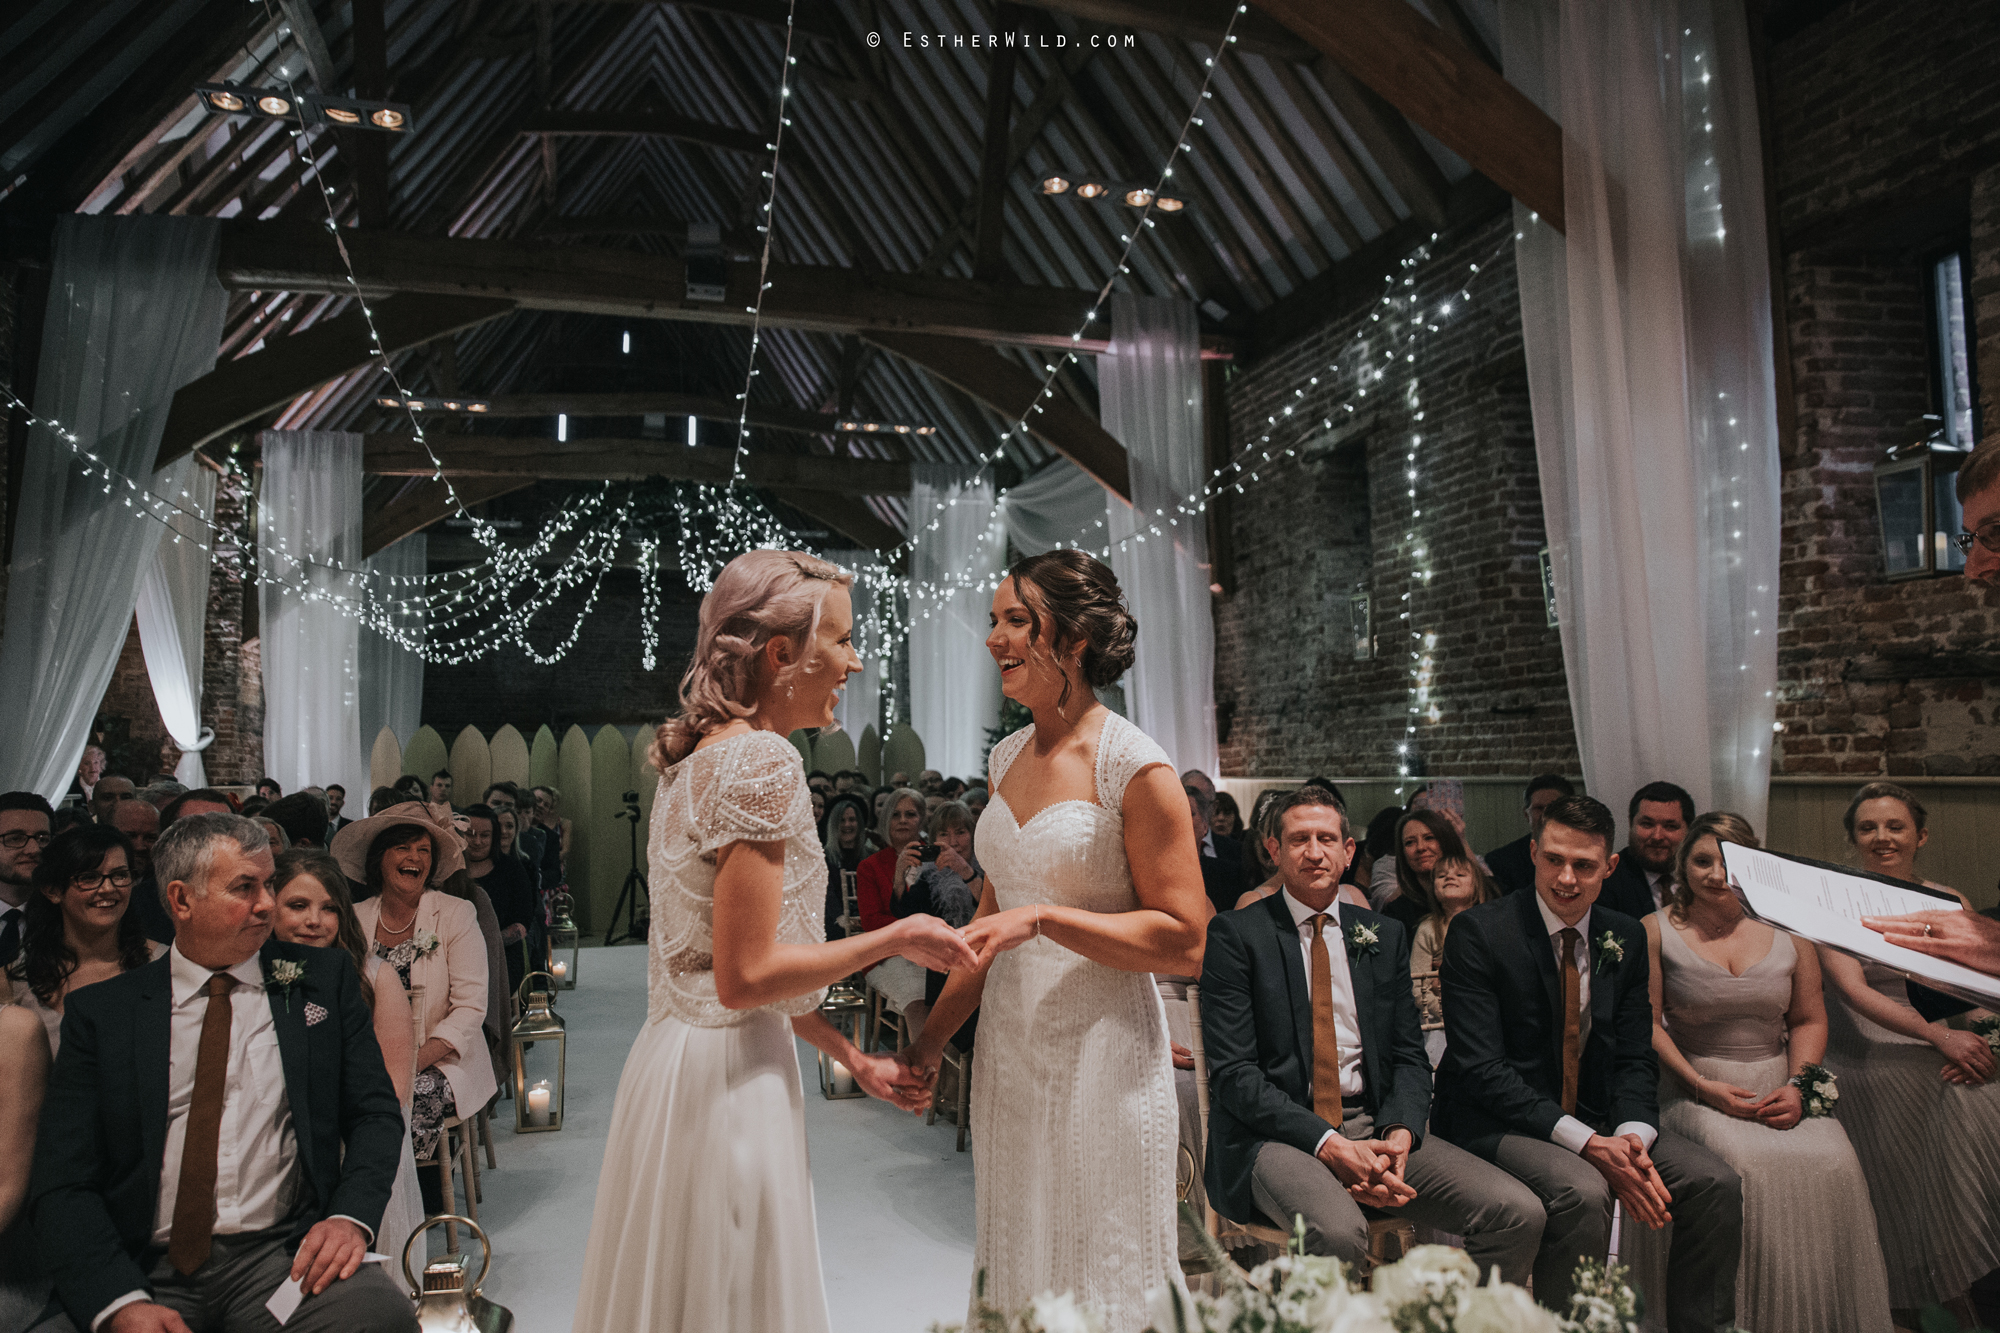 Elms_Barn_Weddings_Suffolk_Photographer_Copyright_Esther_Wild_IMG_1231.jpg